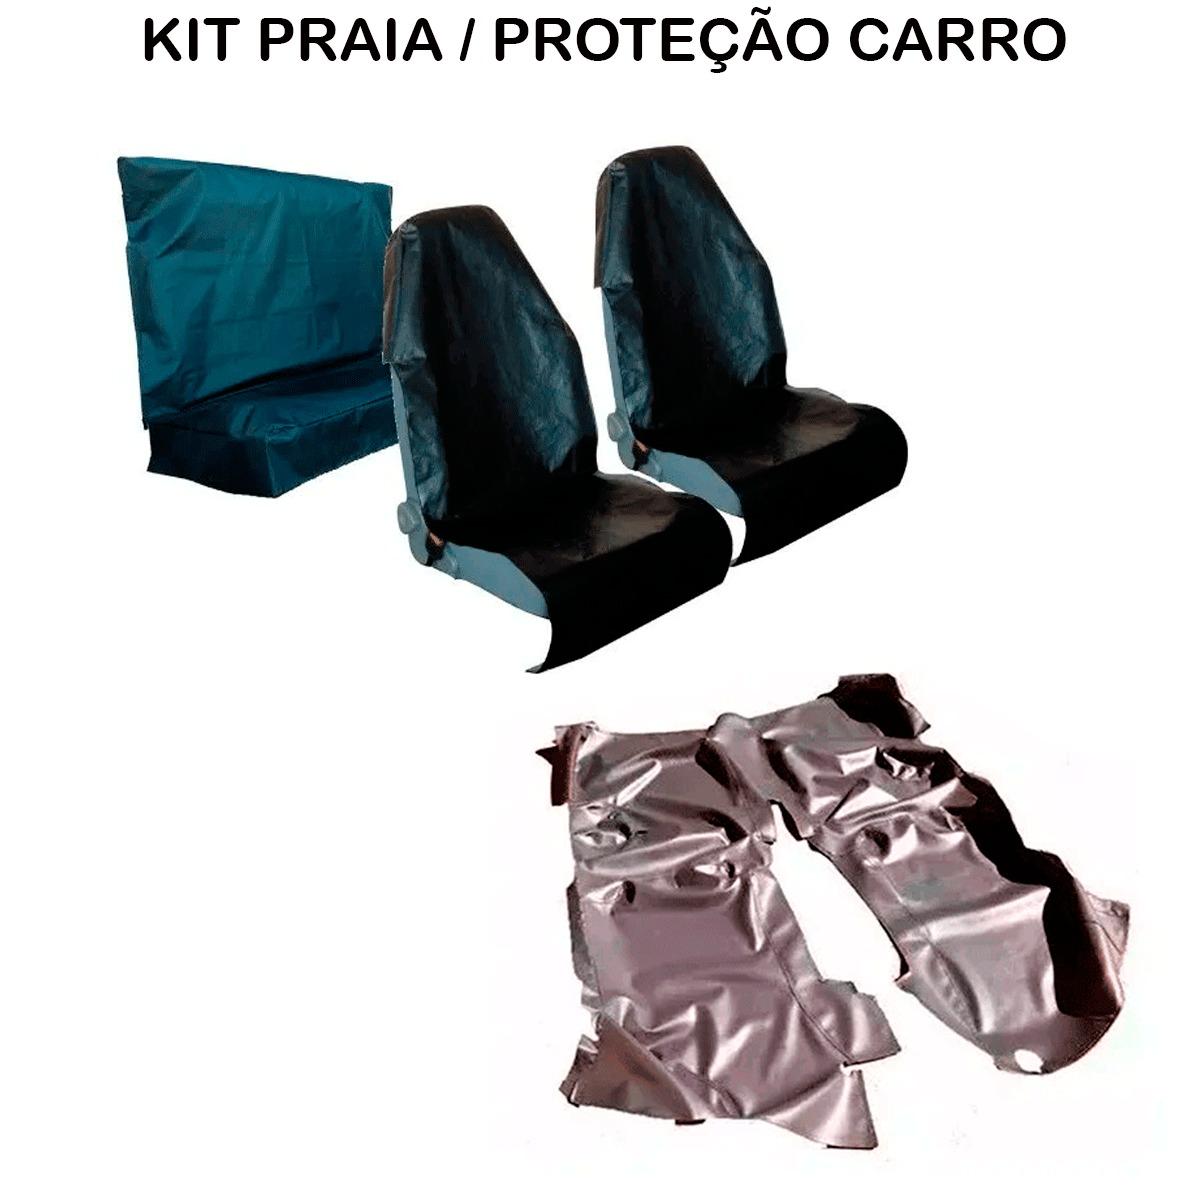 Tapete Em Vinil Fiat Toro Dupla + Capa Banco Protecao Banco Areia Suor Academia